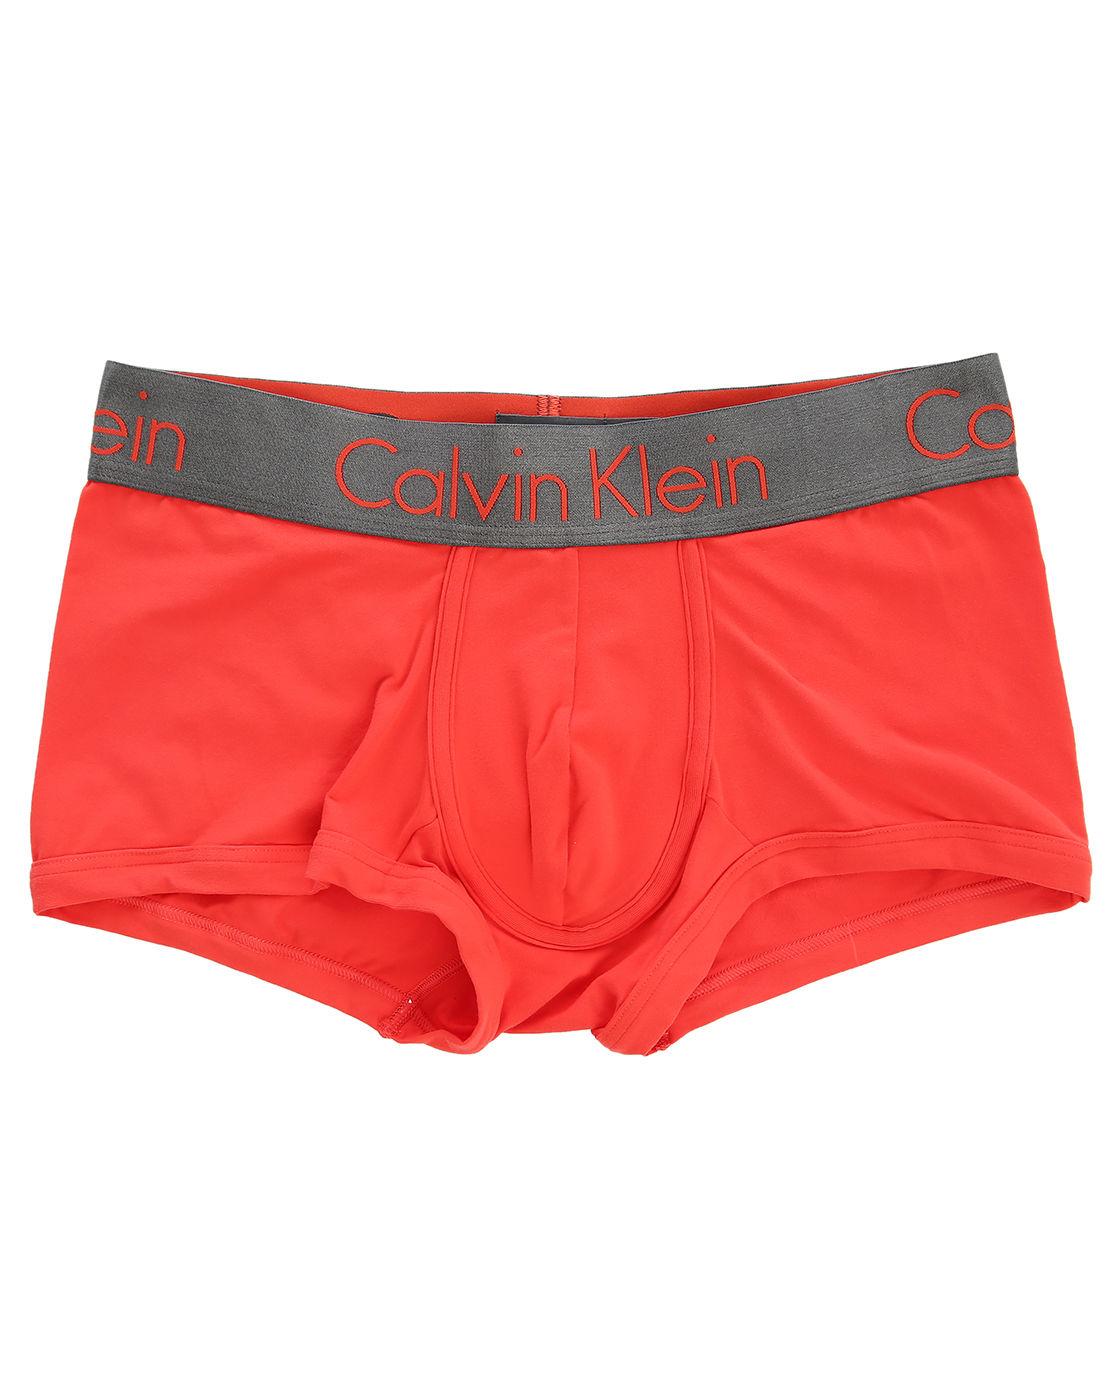 calvin klein coral zinc microfibre boxer shorts in red for. Black Bedroom Furniture Sets. Home Design Ideas